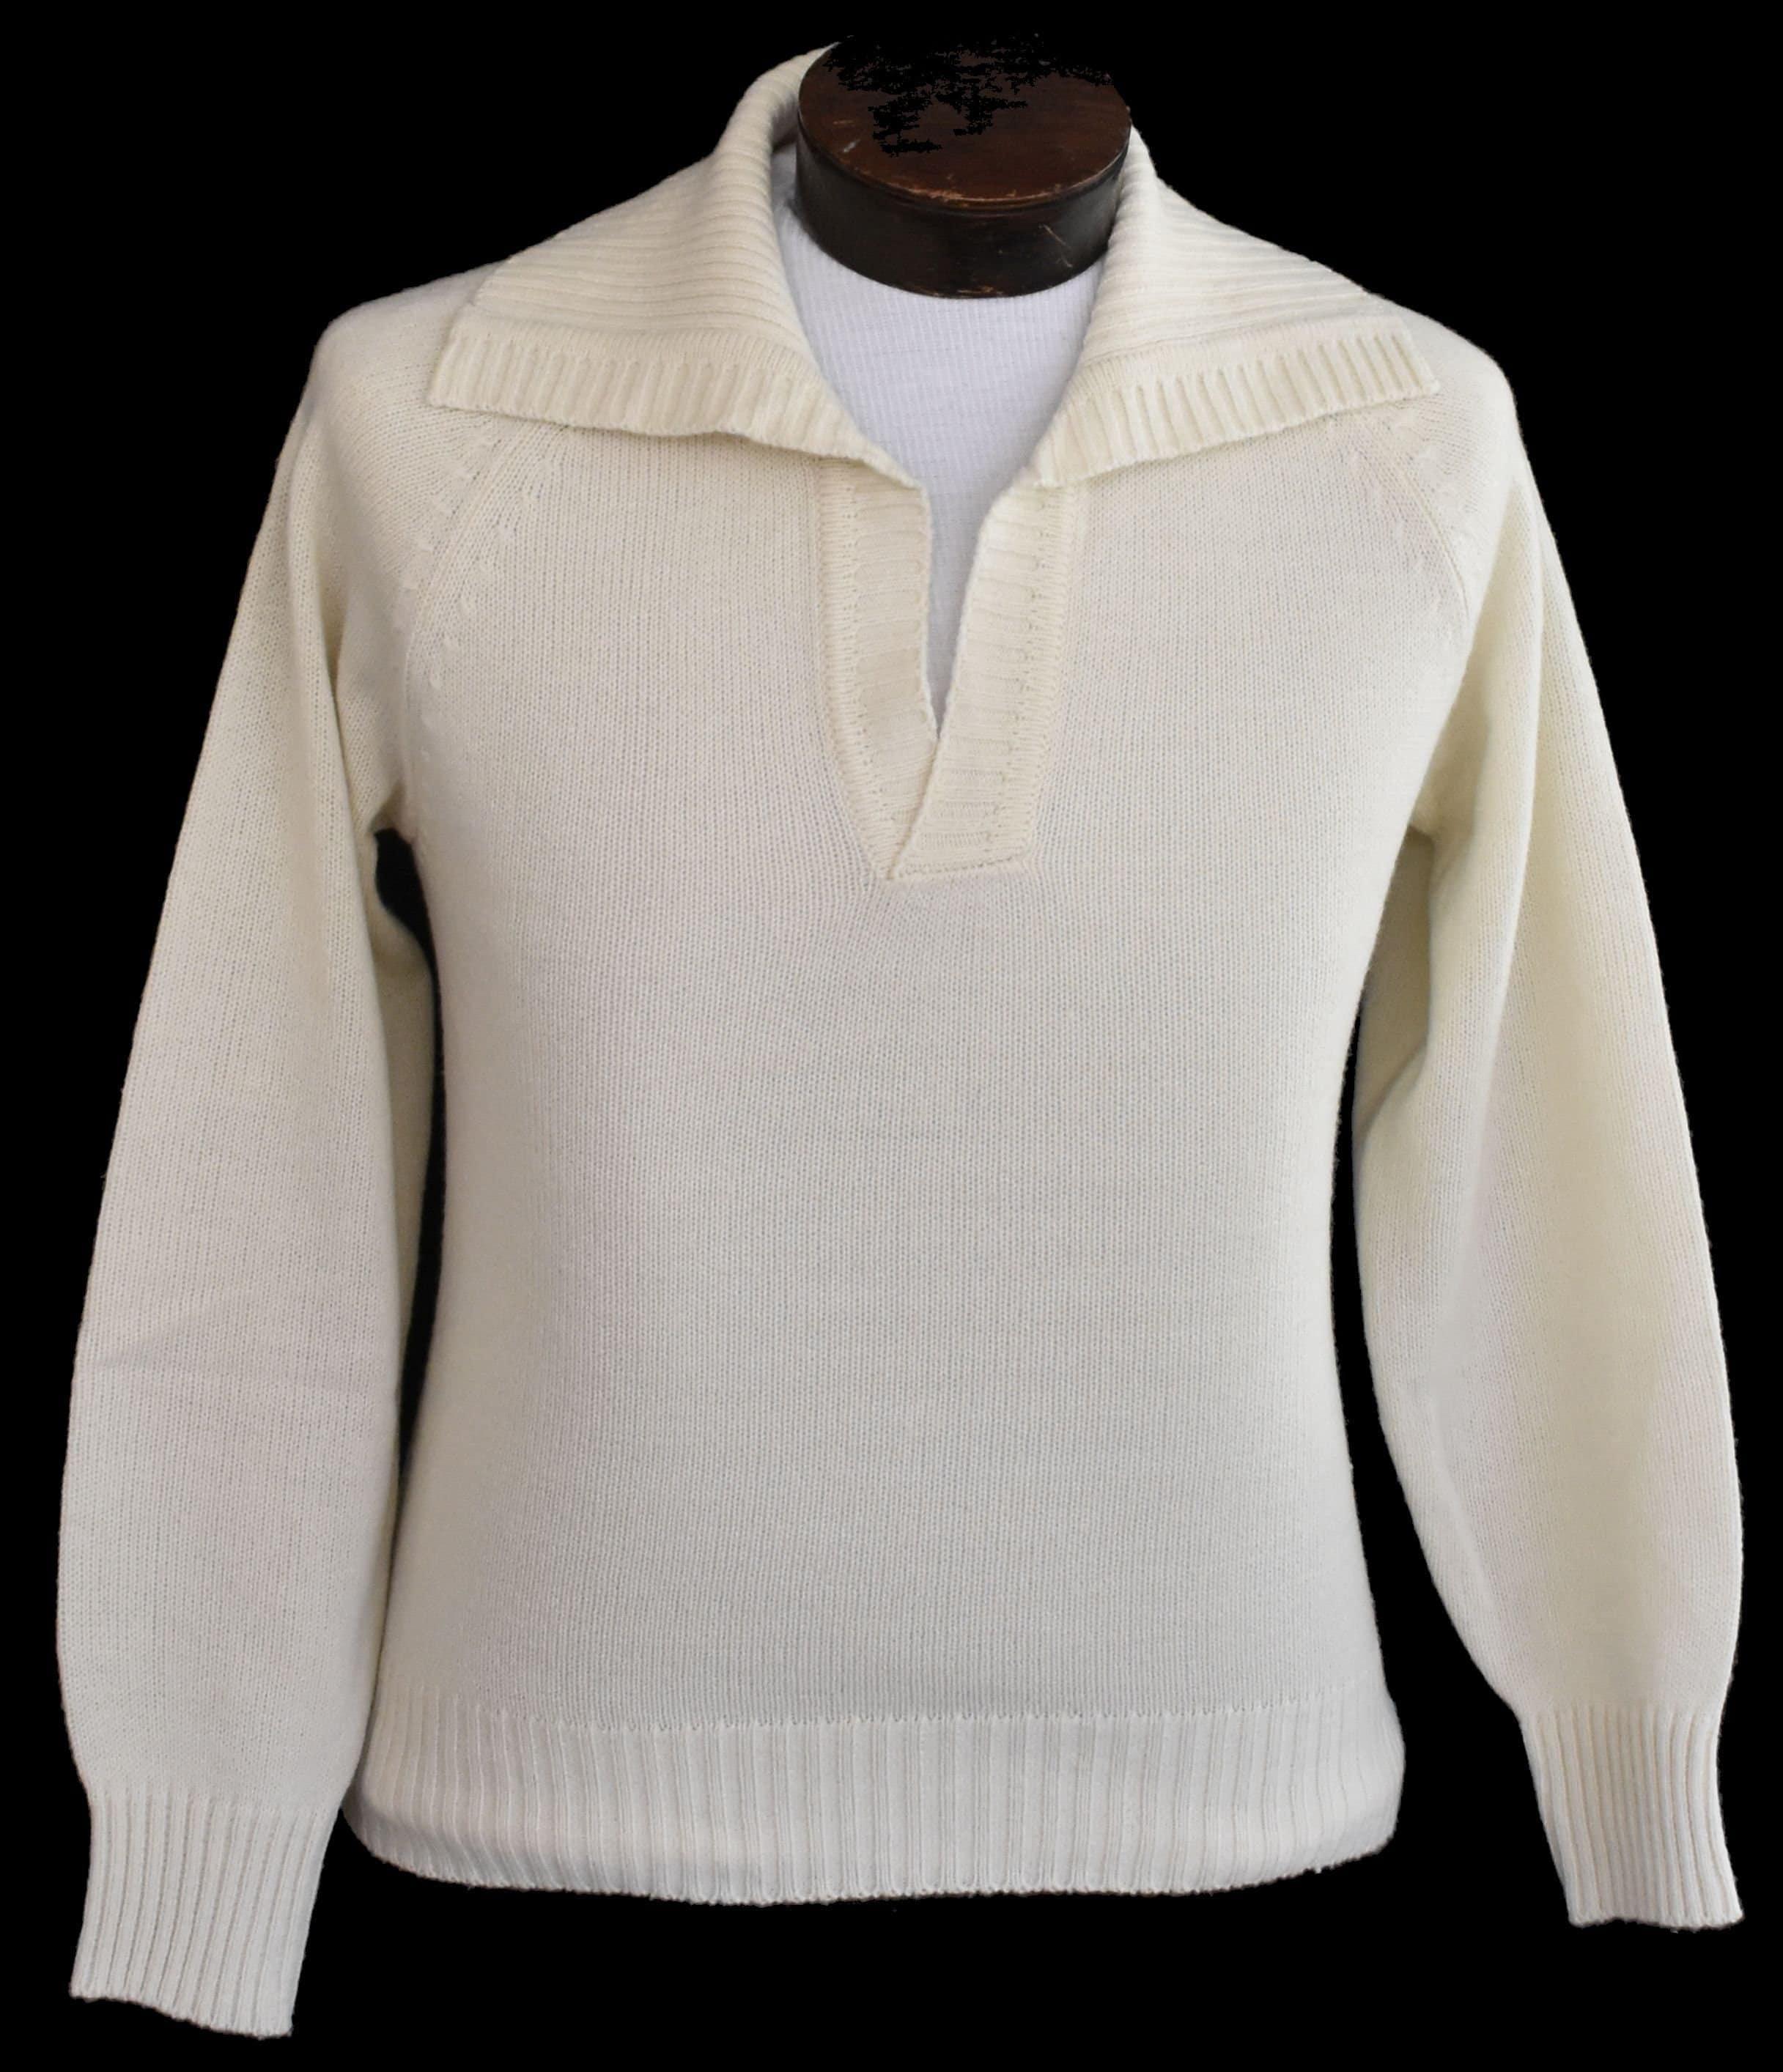 Vintage Johnny Collar Sweater 60s Men Pullover Shirt 1960s Etsy